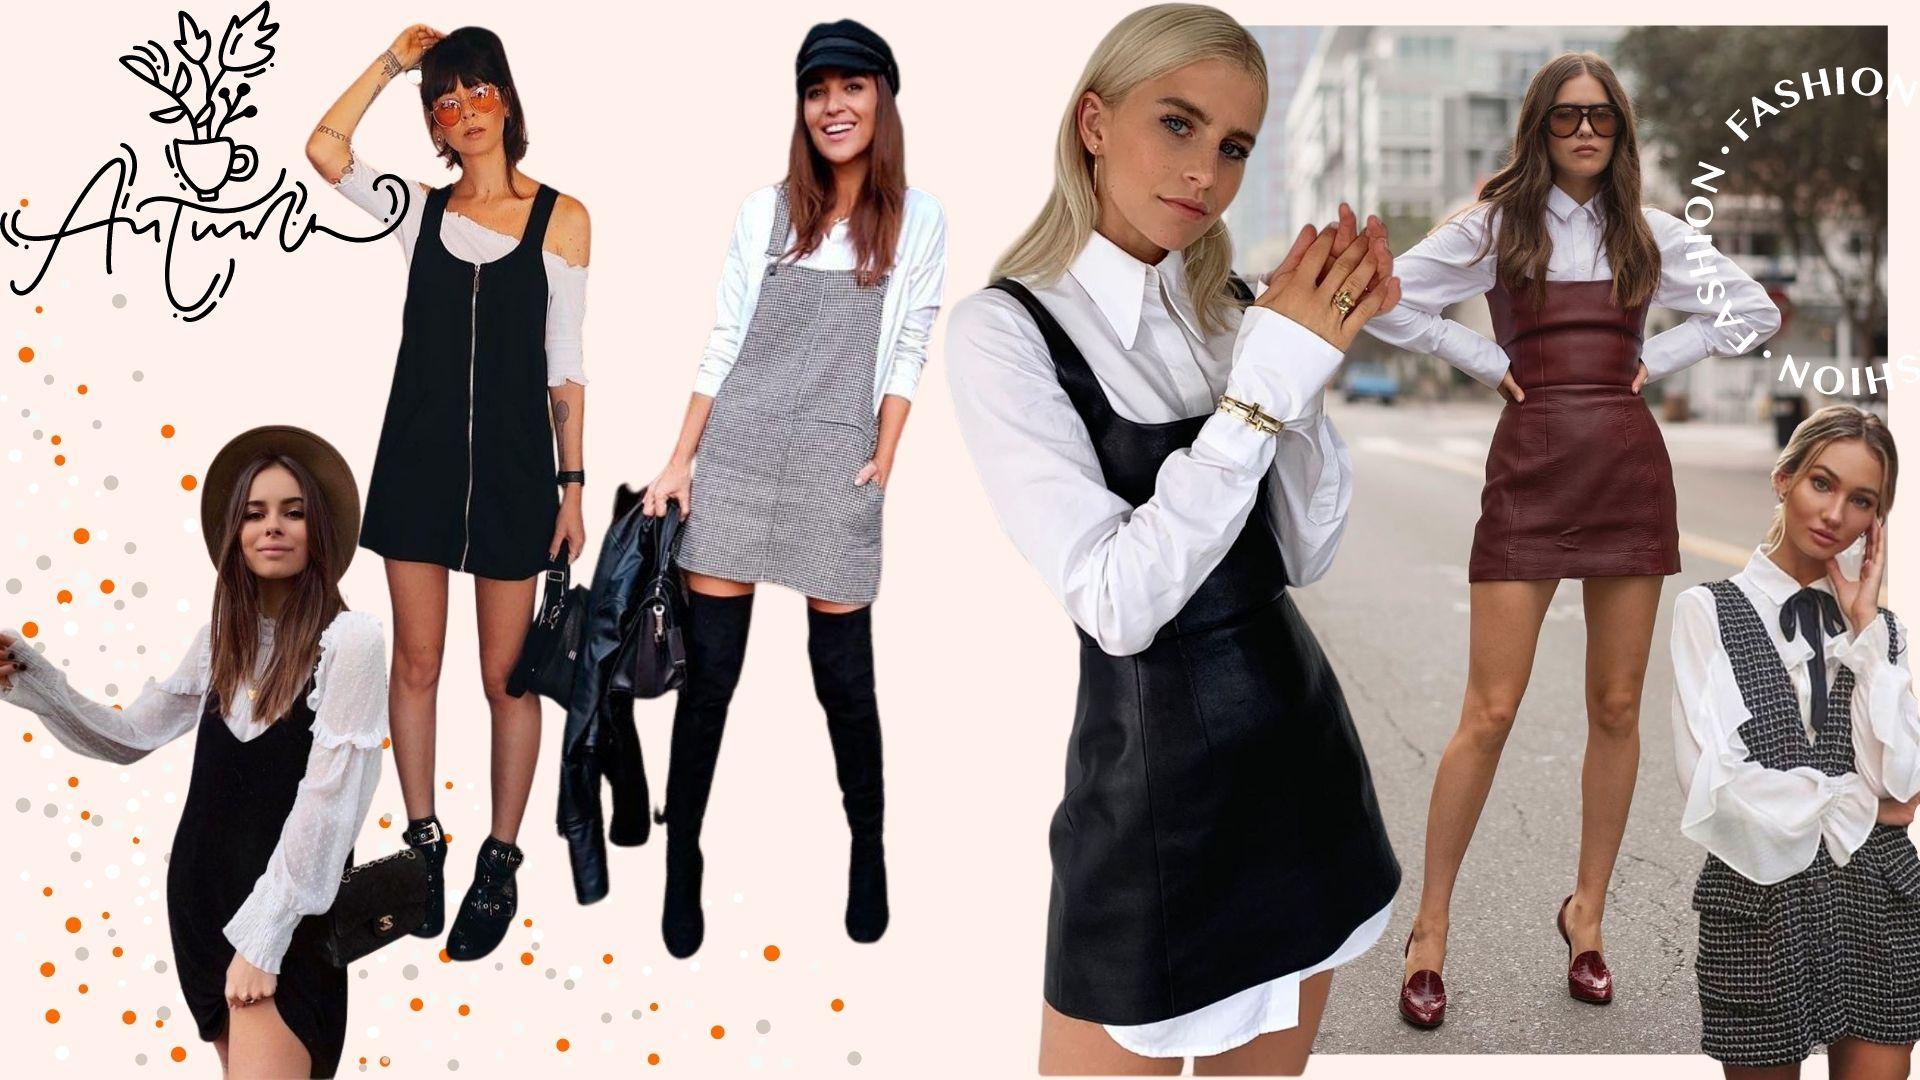 Pichi dress - Trend fall 2020